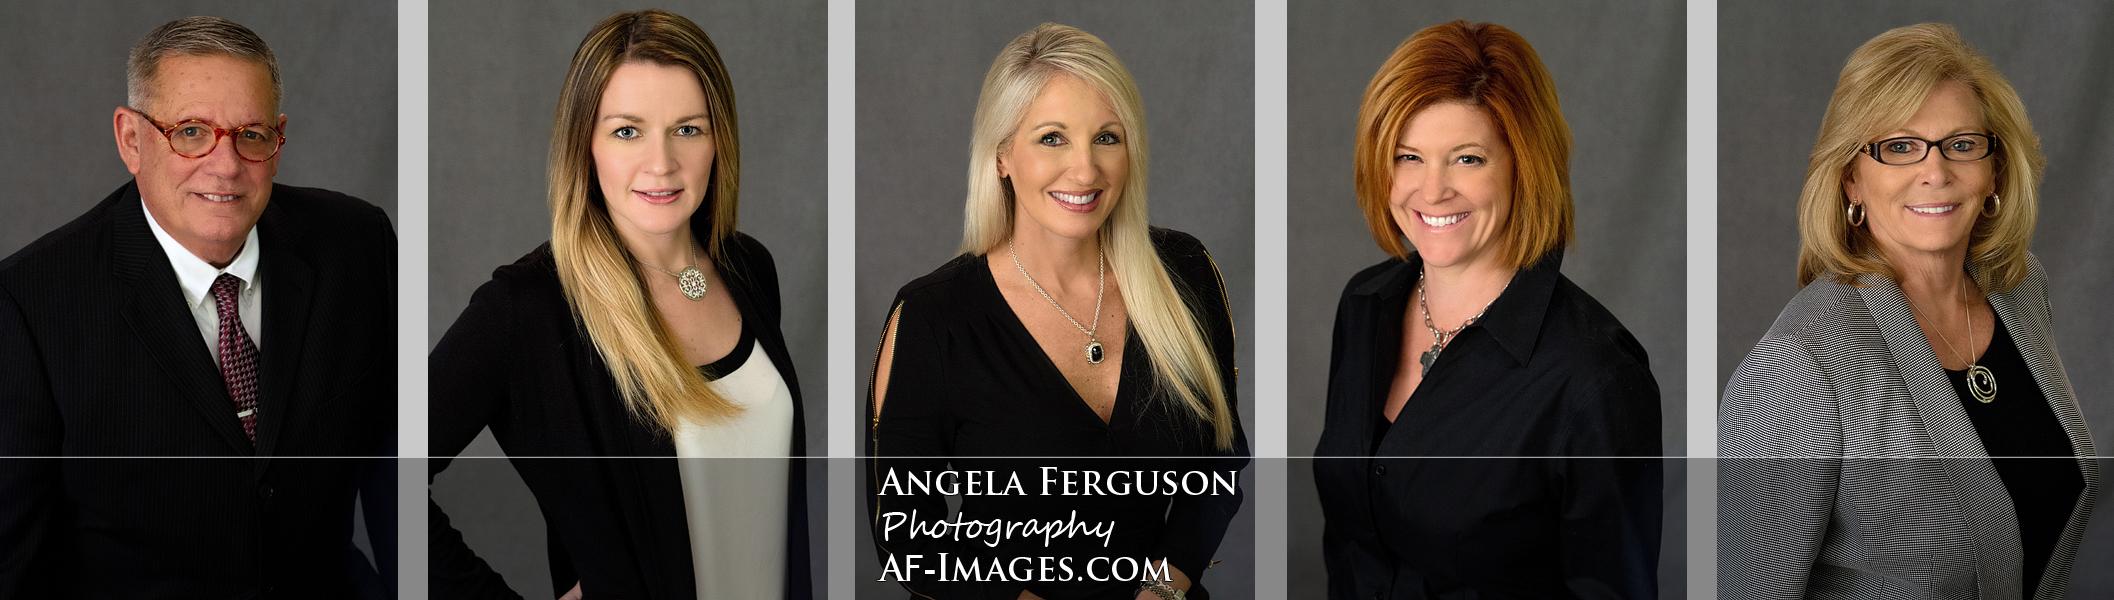 Composite of employee headshots.  Akers Business Solutions , Glen Burnie, MD. Copyright 2017, Angela Ferguson Photography.